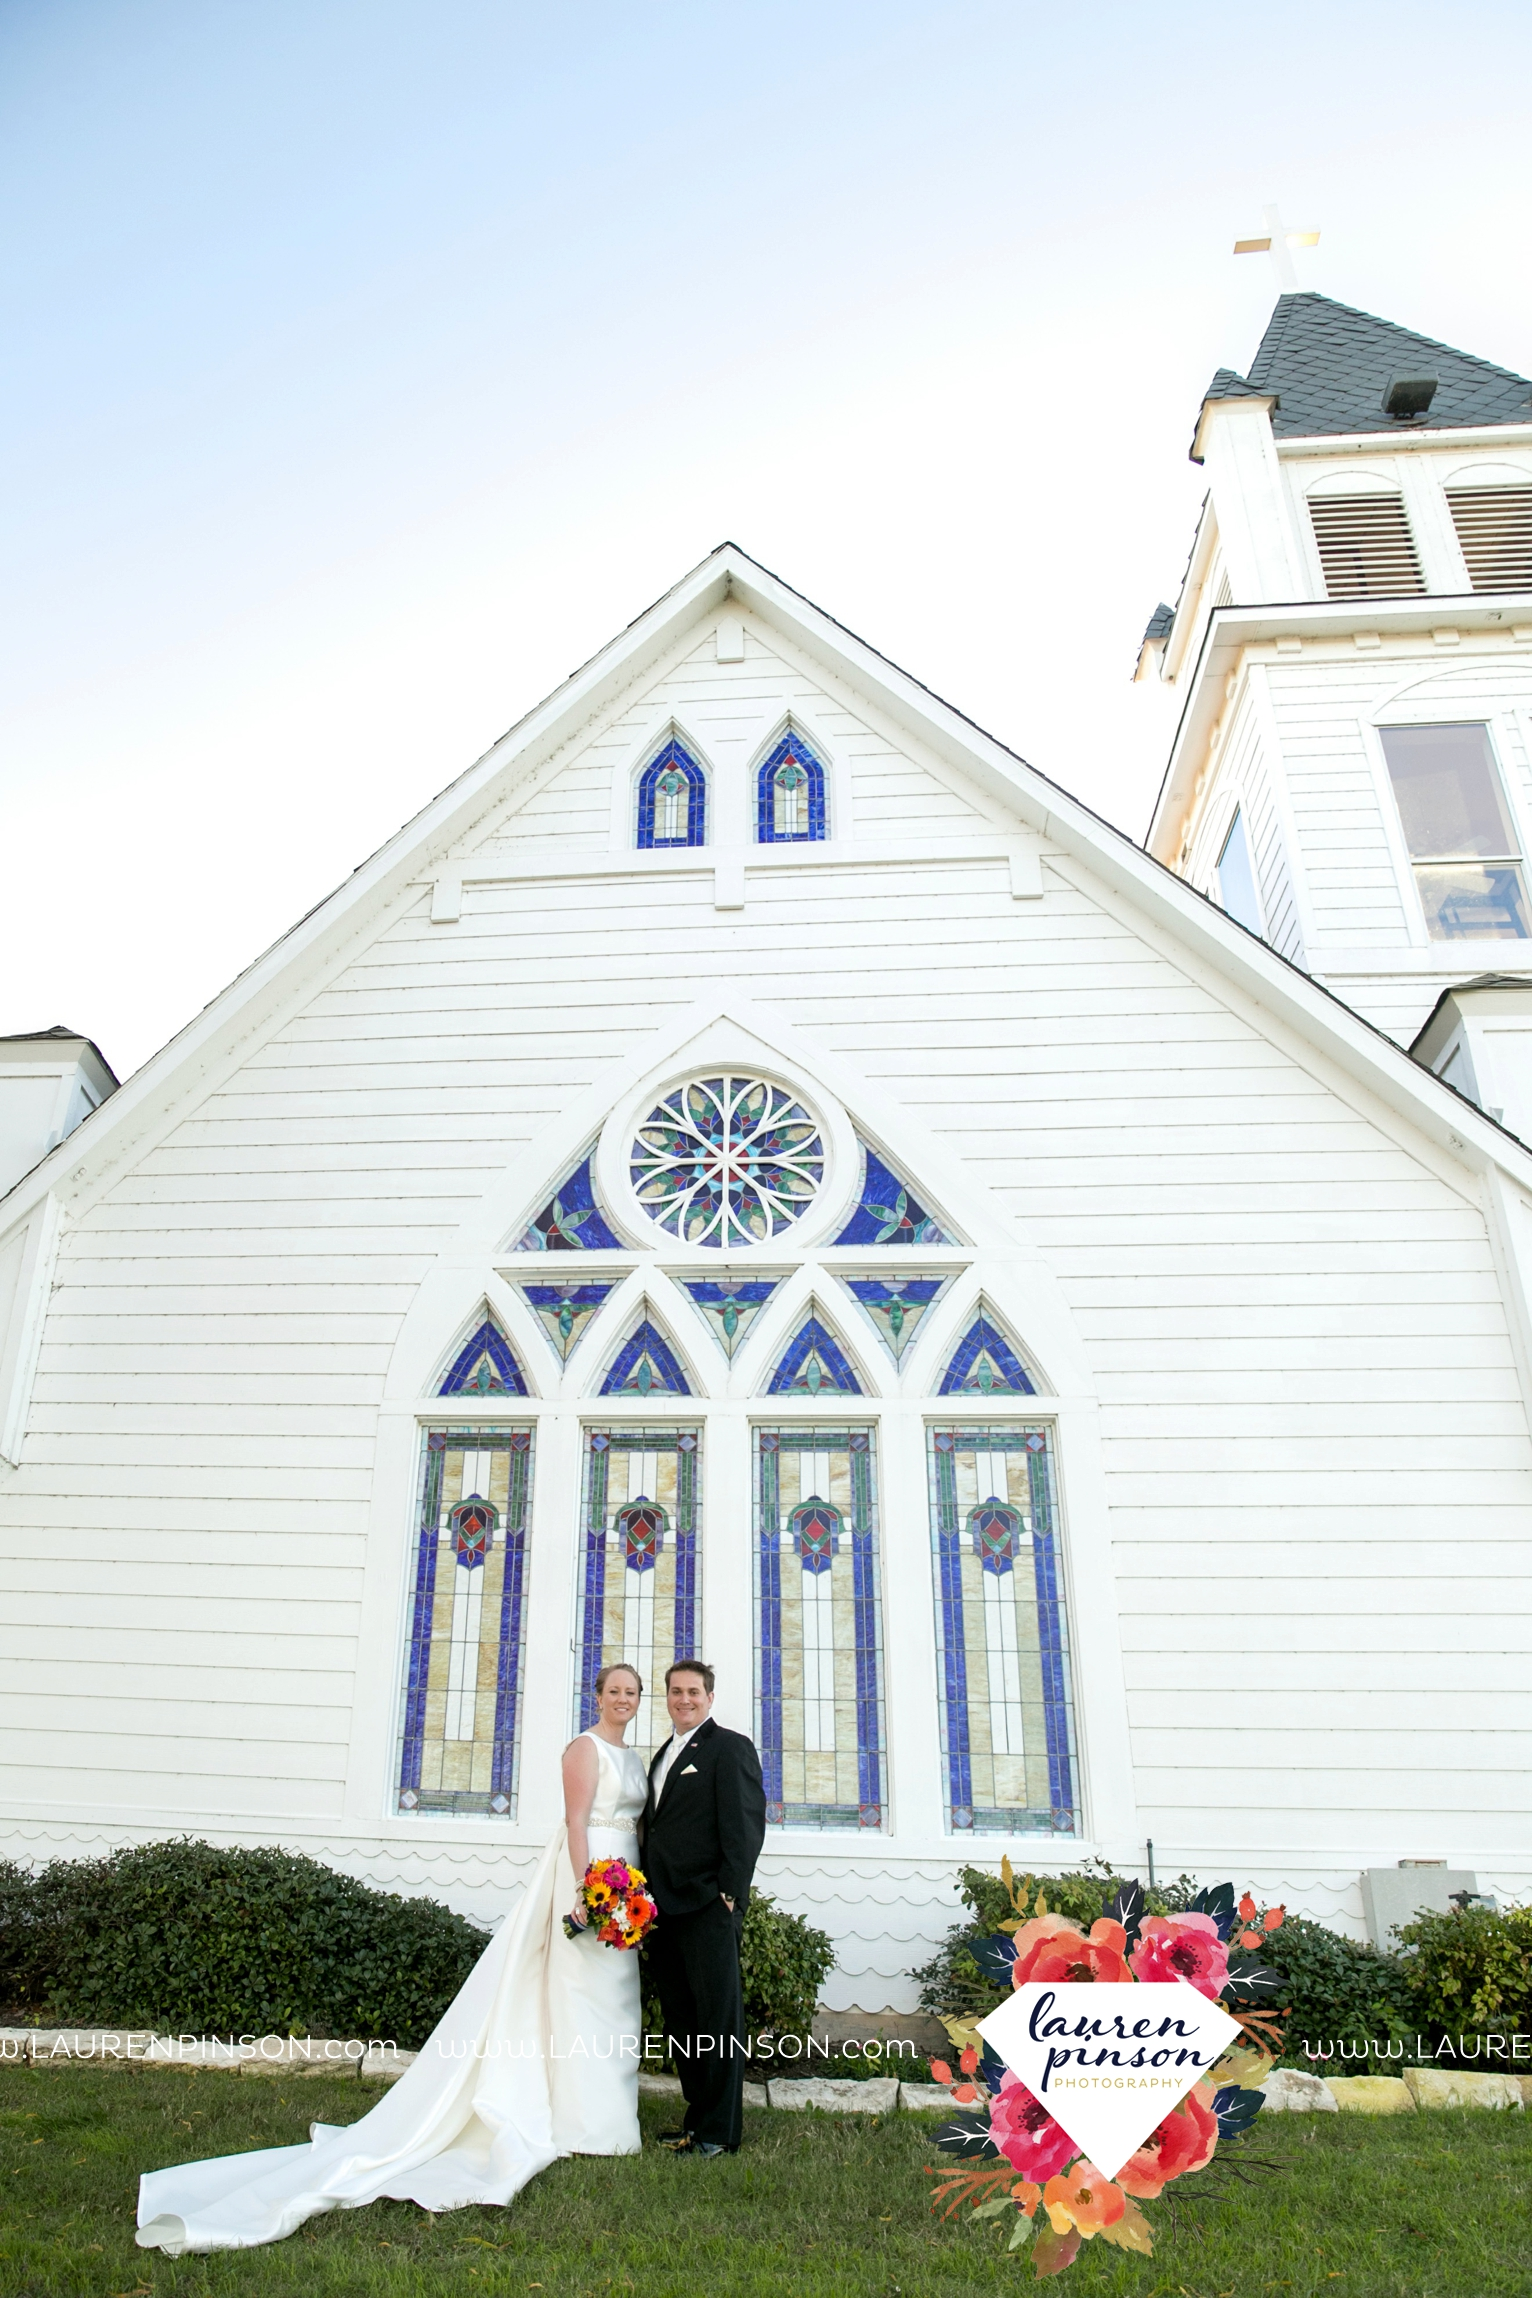 bells-texas-wedding-photography-at-willowood-ranch-chapel-north-texas-wichita-falls-wedding-photographer_1845.jpg